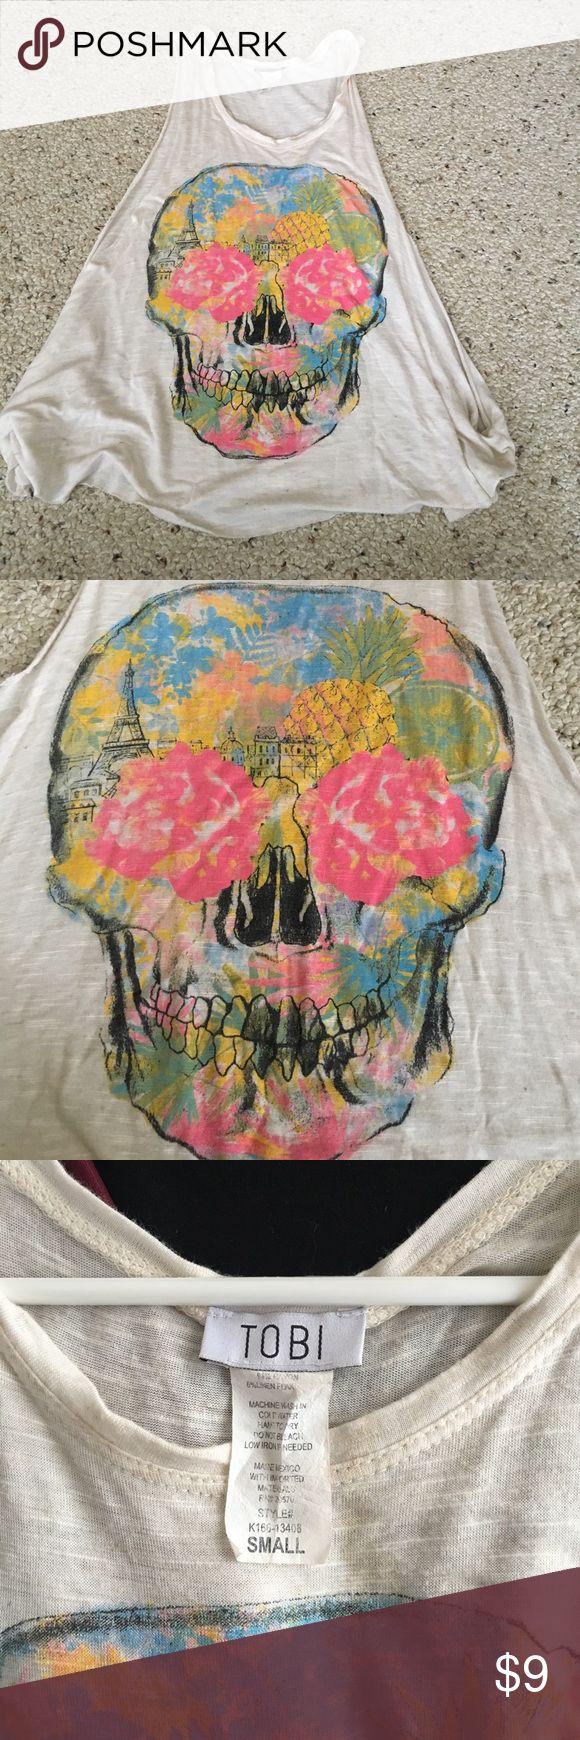 Tobi skull shirt Deep side cut tank top with colorful floral design Tobi Tops Tank Tops